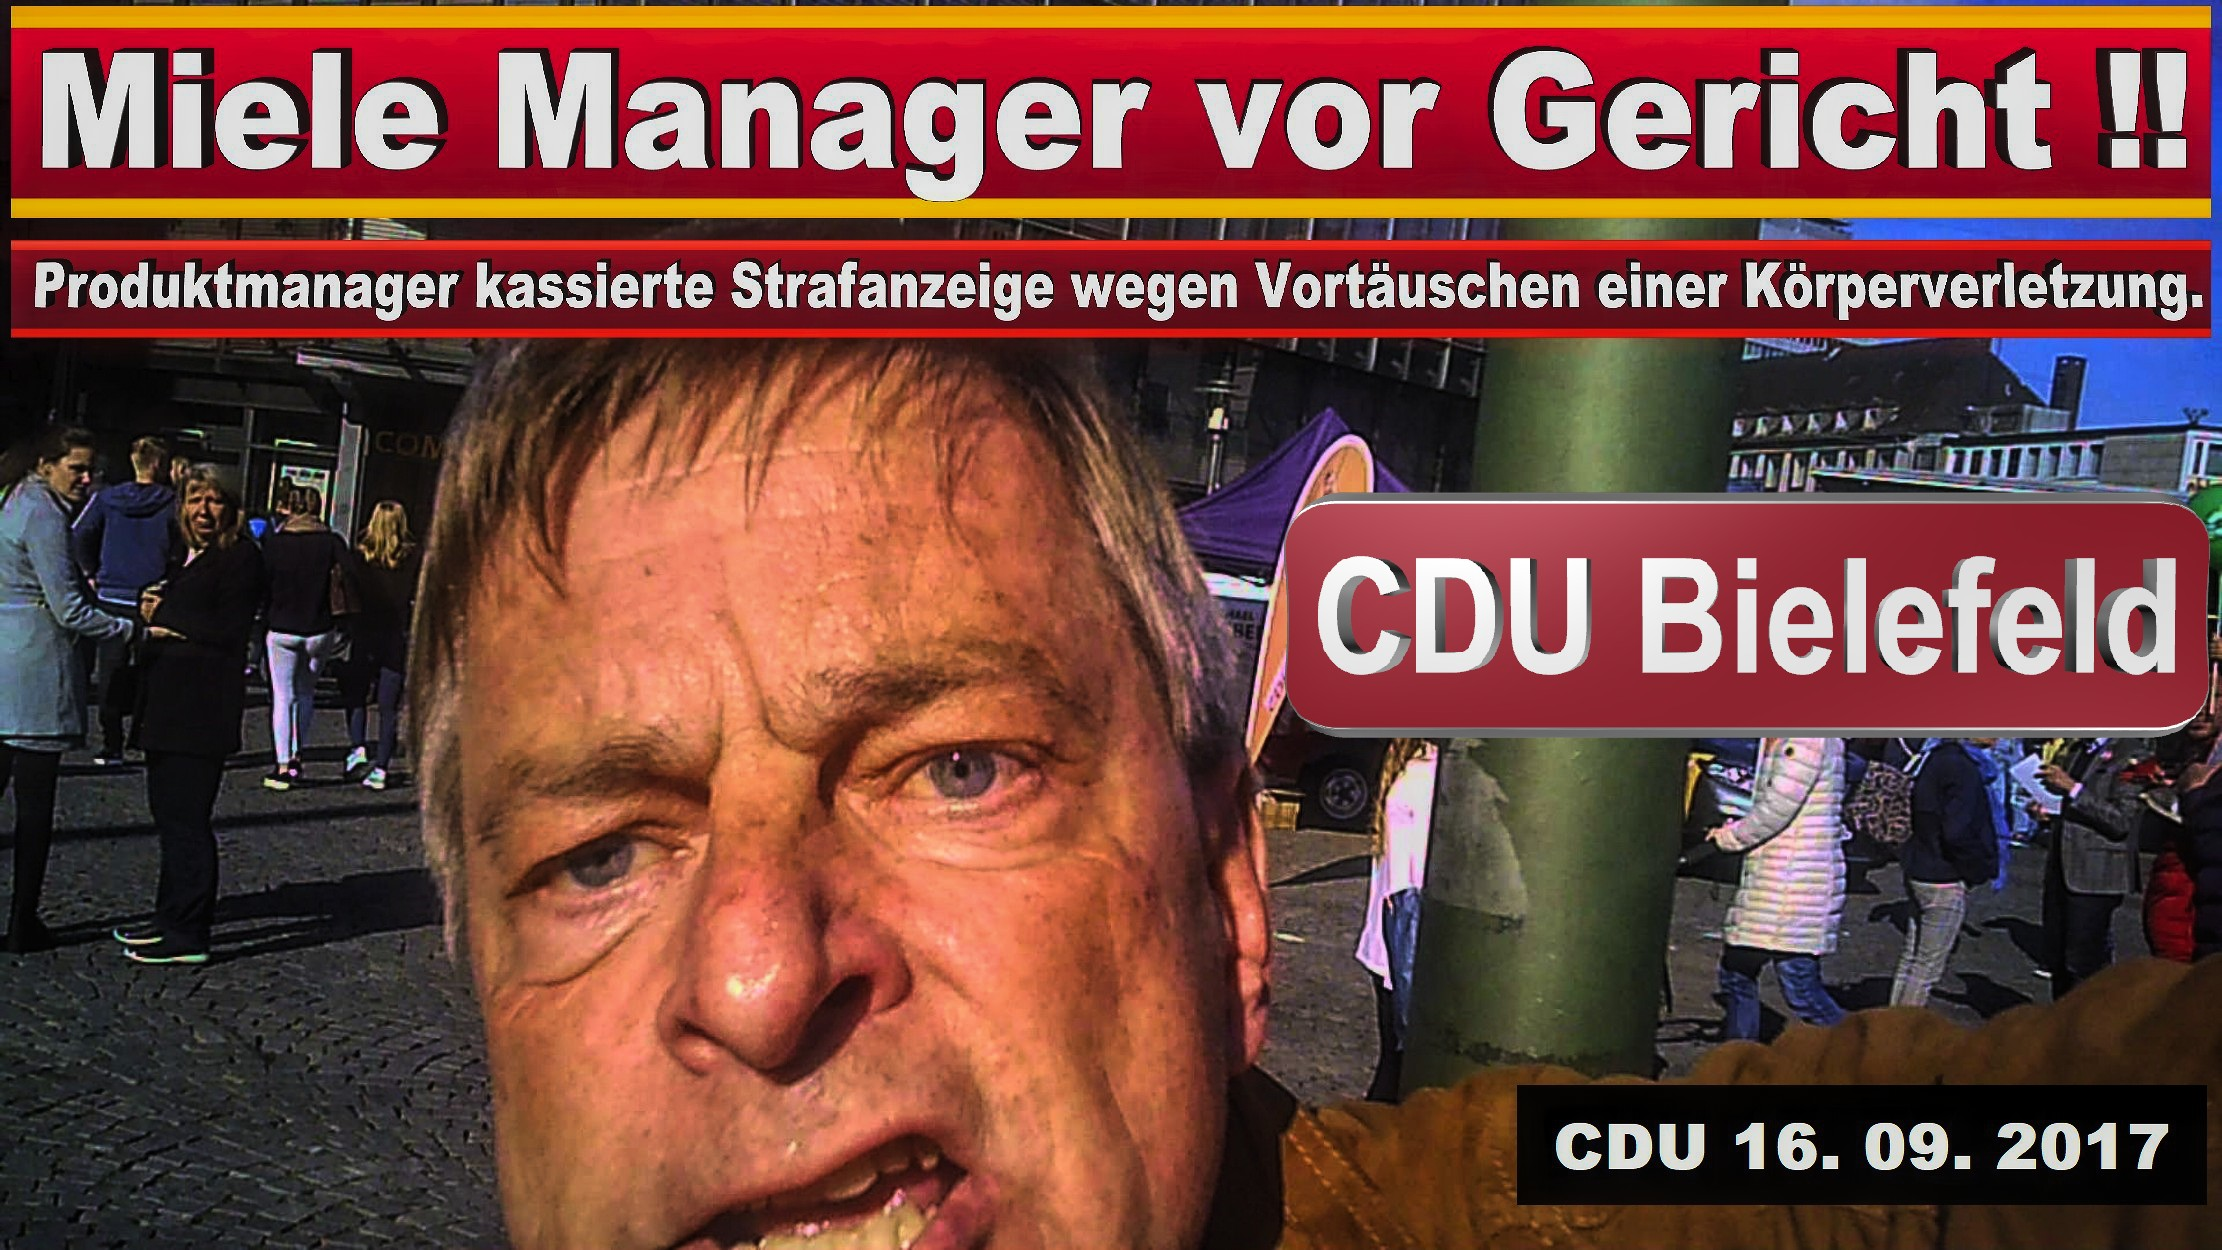 CDU BIELEFELD RATSFRAKTION MICHAEL WEBER MIELE GüTERSLOH PRODUKTMANAGER JURIST SPD FDP AFD BIELEFELD